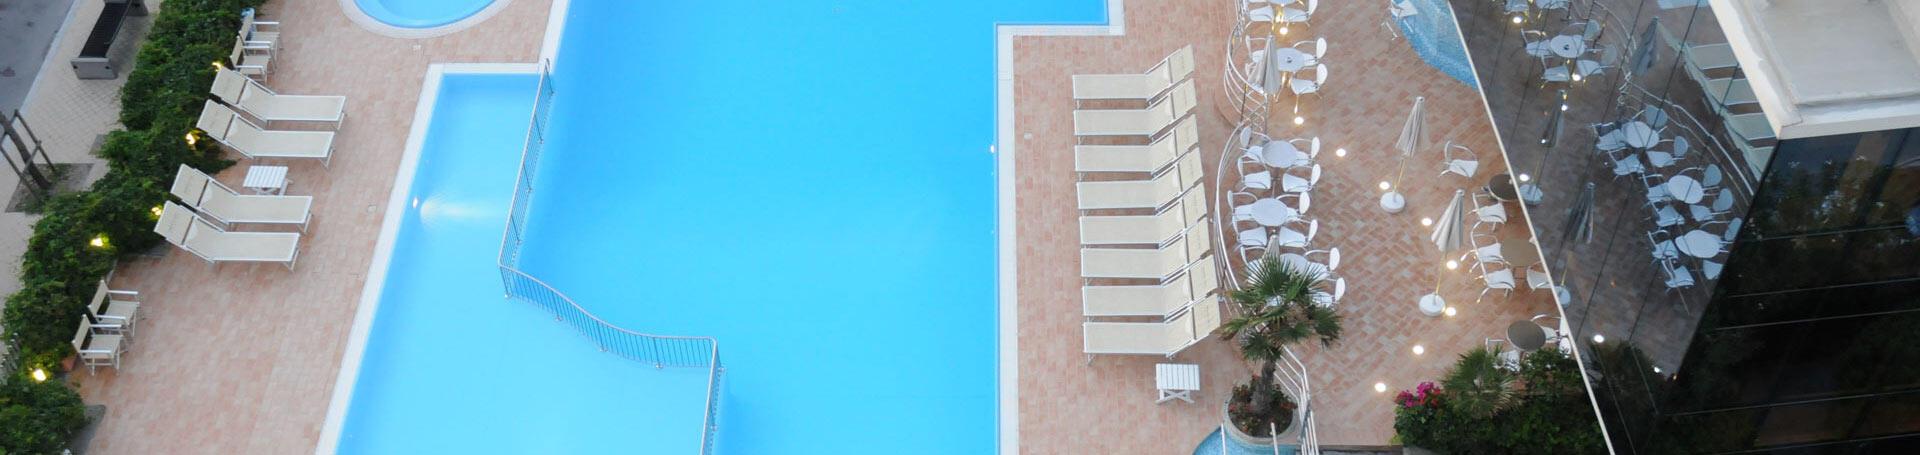 palacelidohotel fr piscine-rechaufee-lido-di-savio 009